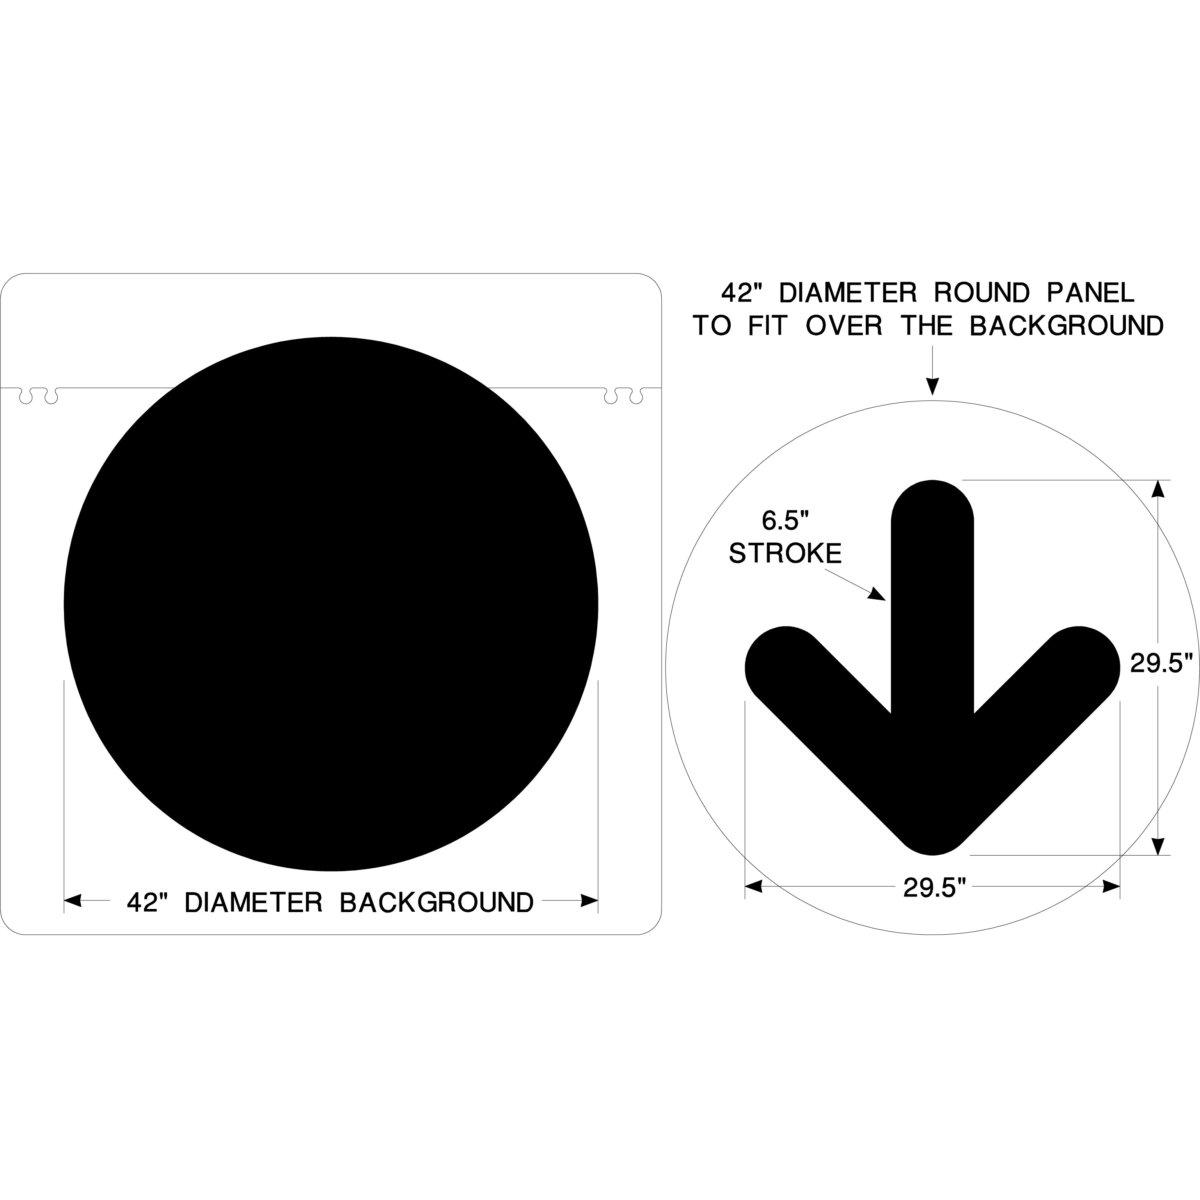 McDONALDS-ARROW-CIRCLE SET